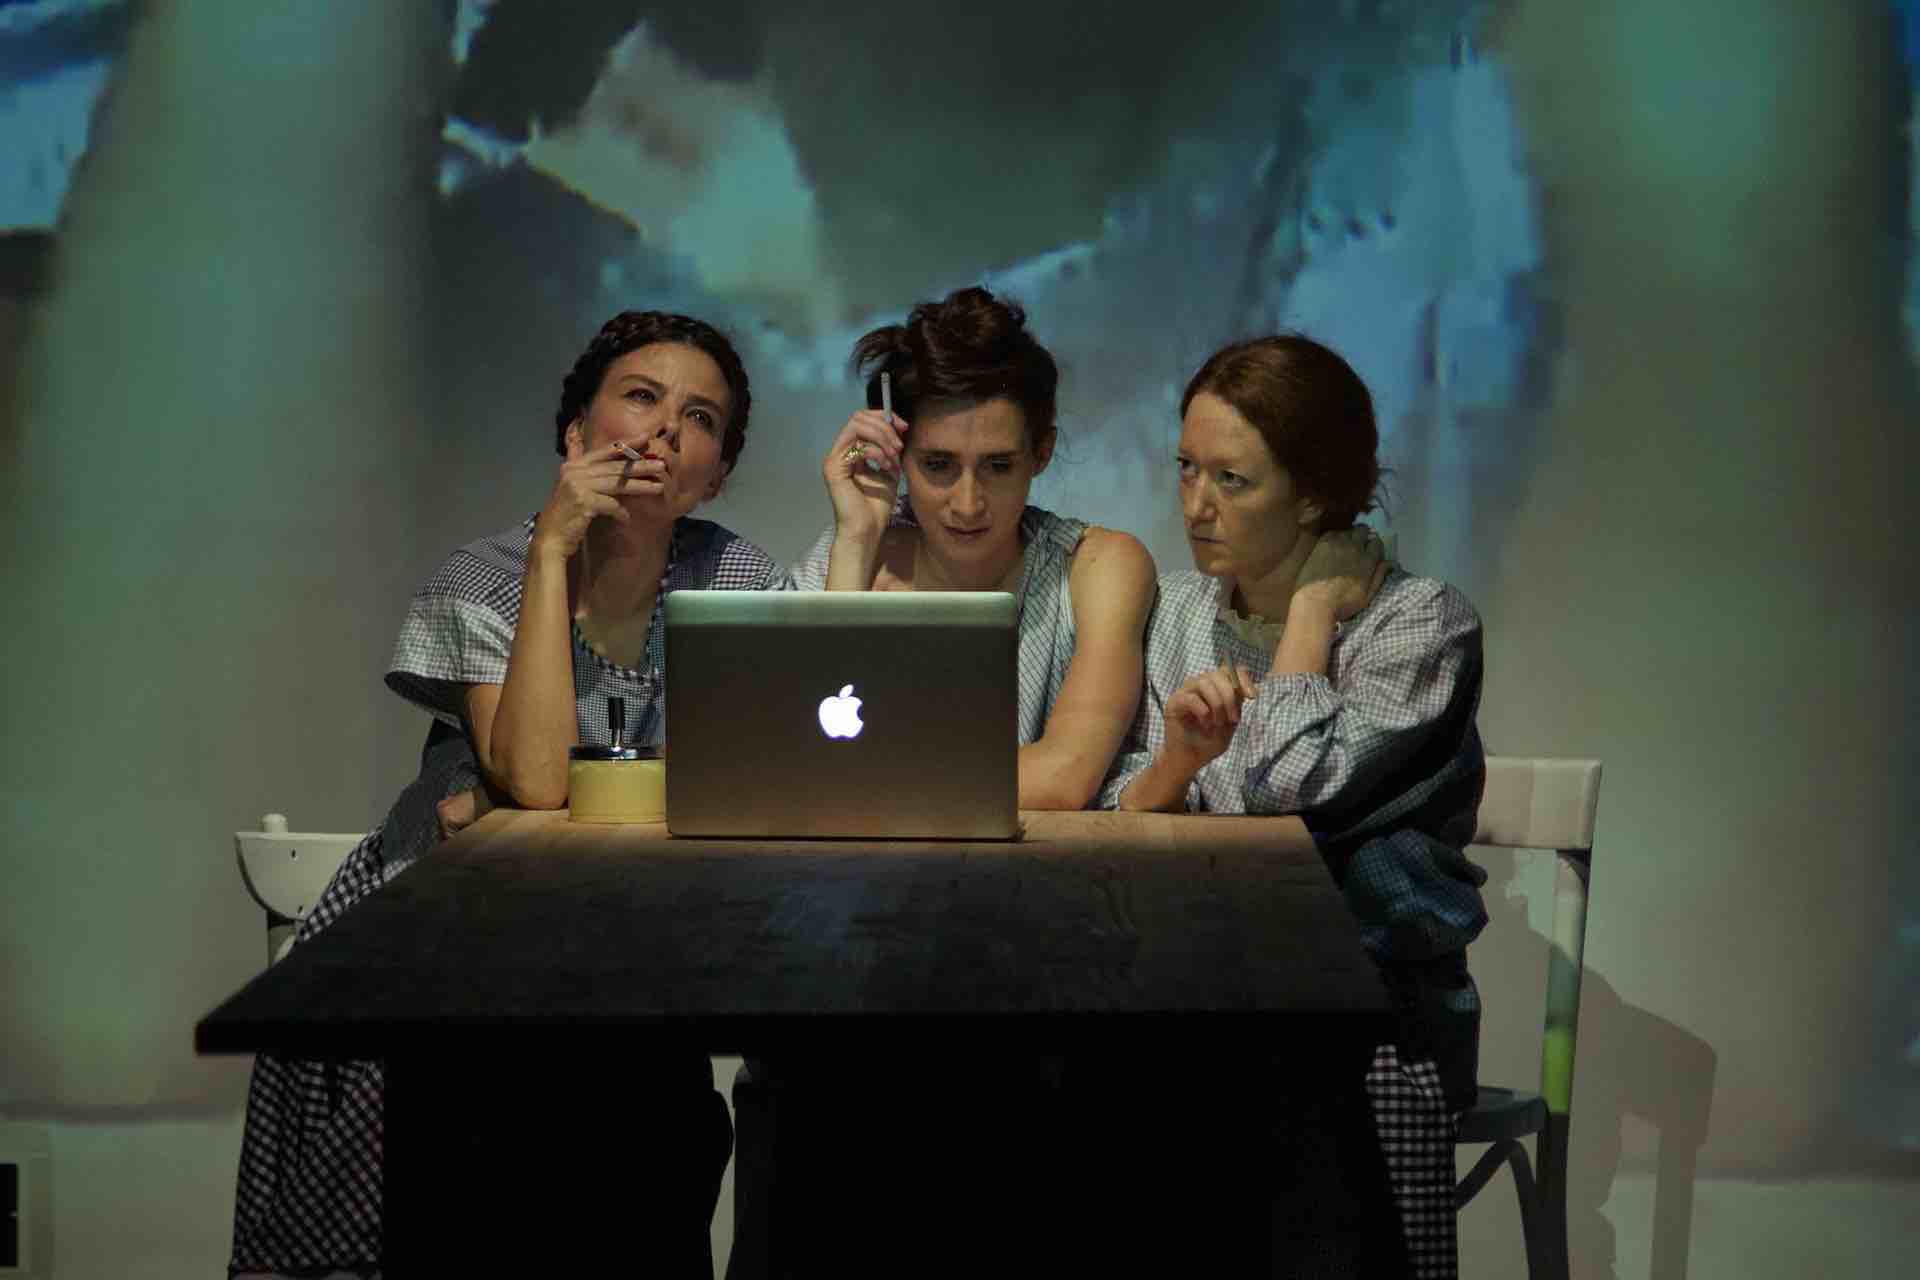 ClaudelKahloWoolf - Monica Mojica - 3 - Blandine Armand - Captations